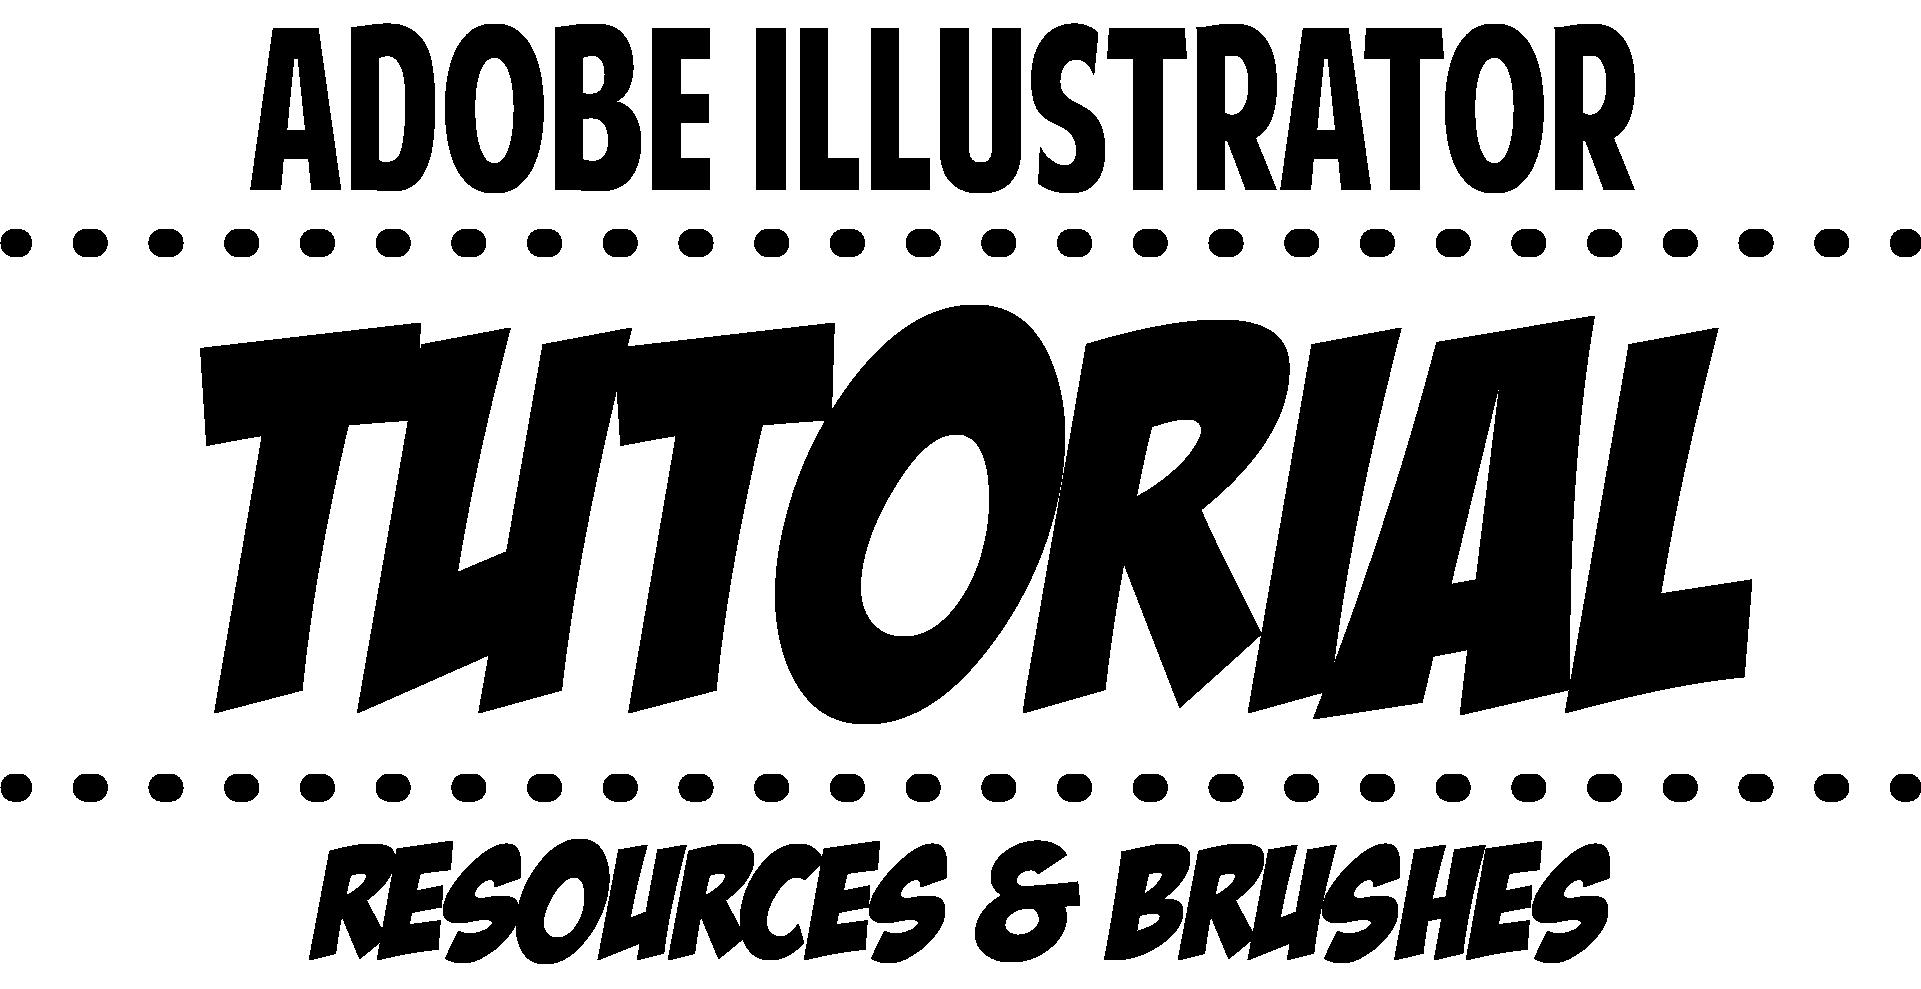 Adobe Illustrator Tutorials for Beginners Best Of Beginner Adobe Illustrator Tutorial Using Shapes Jason